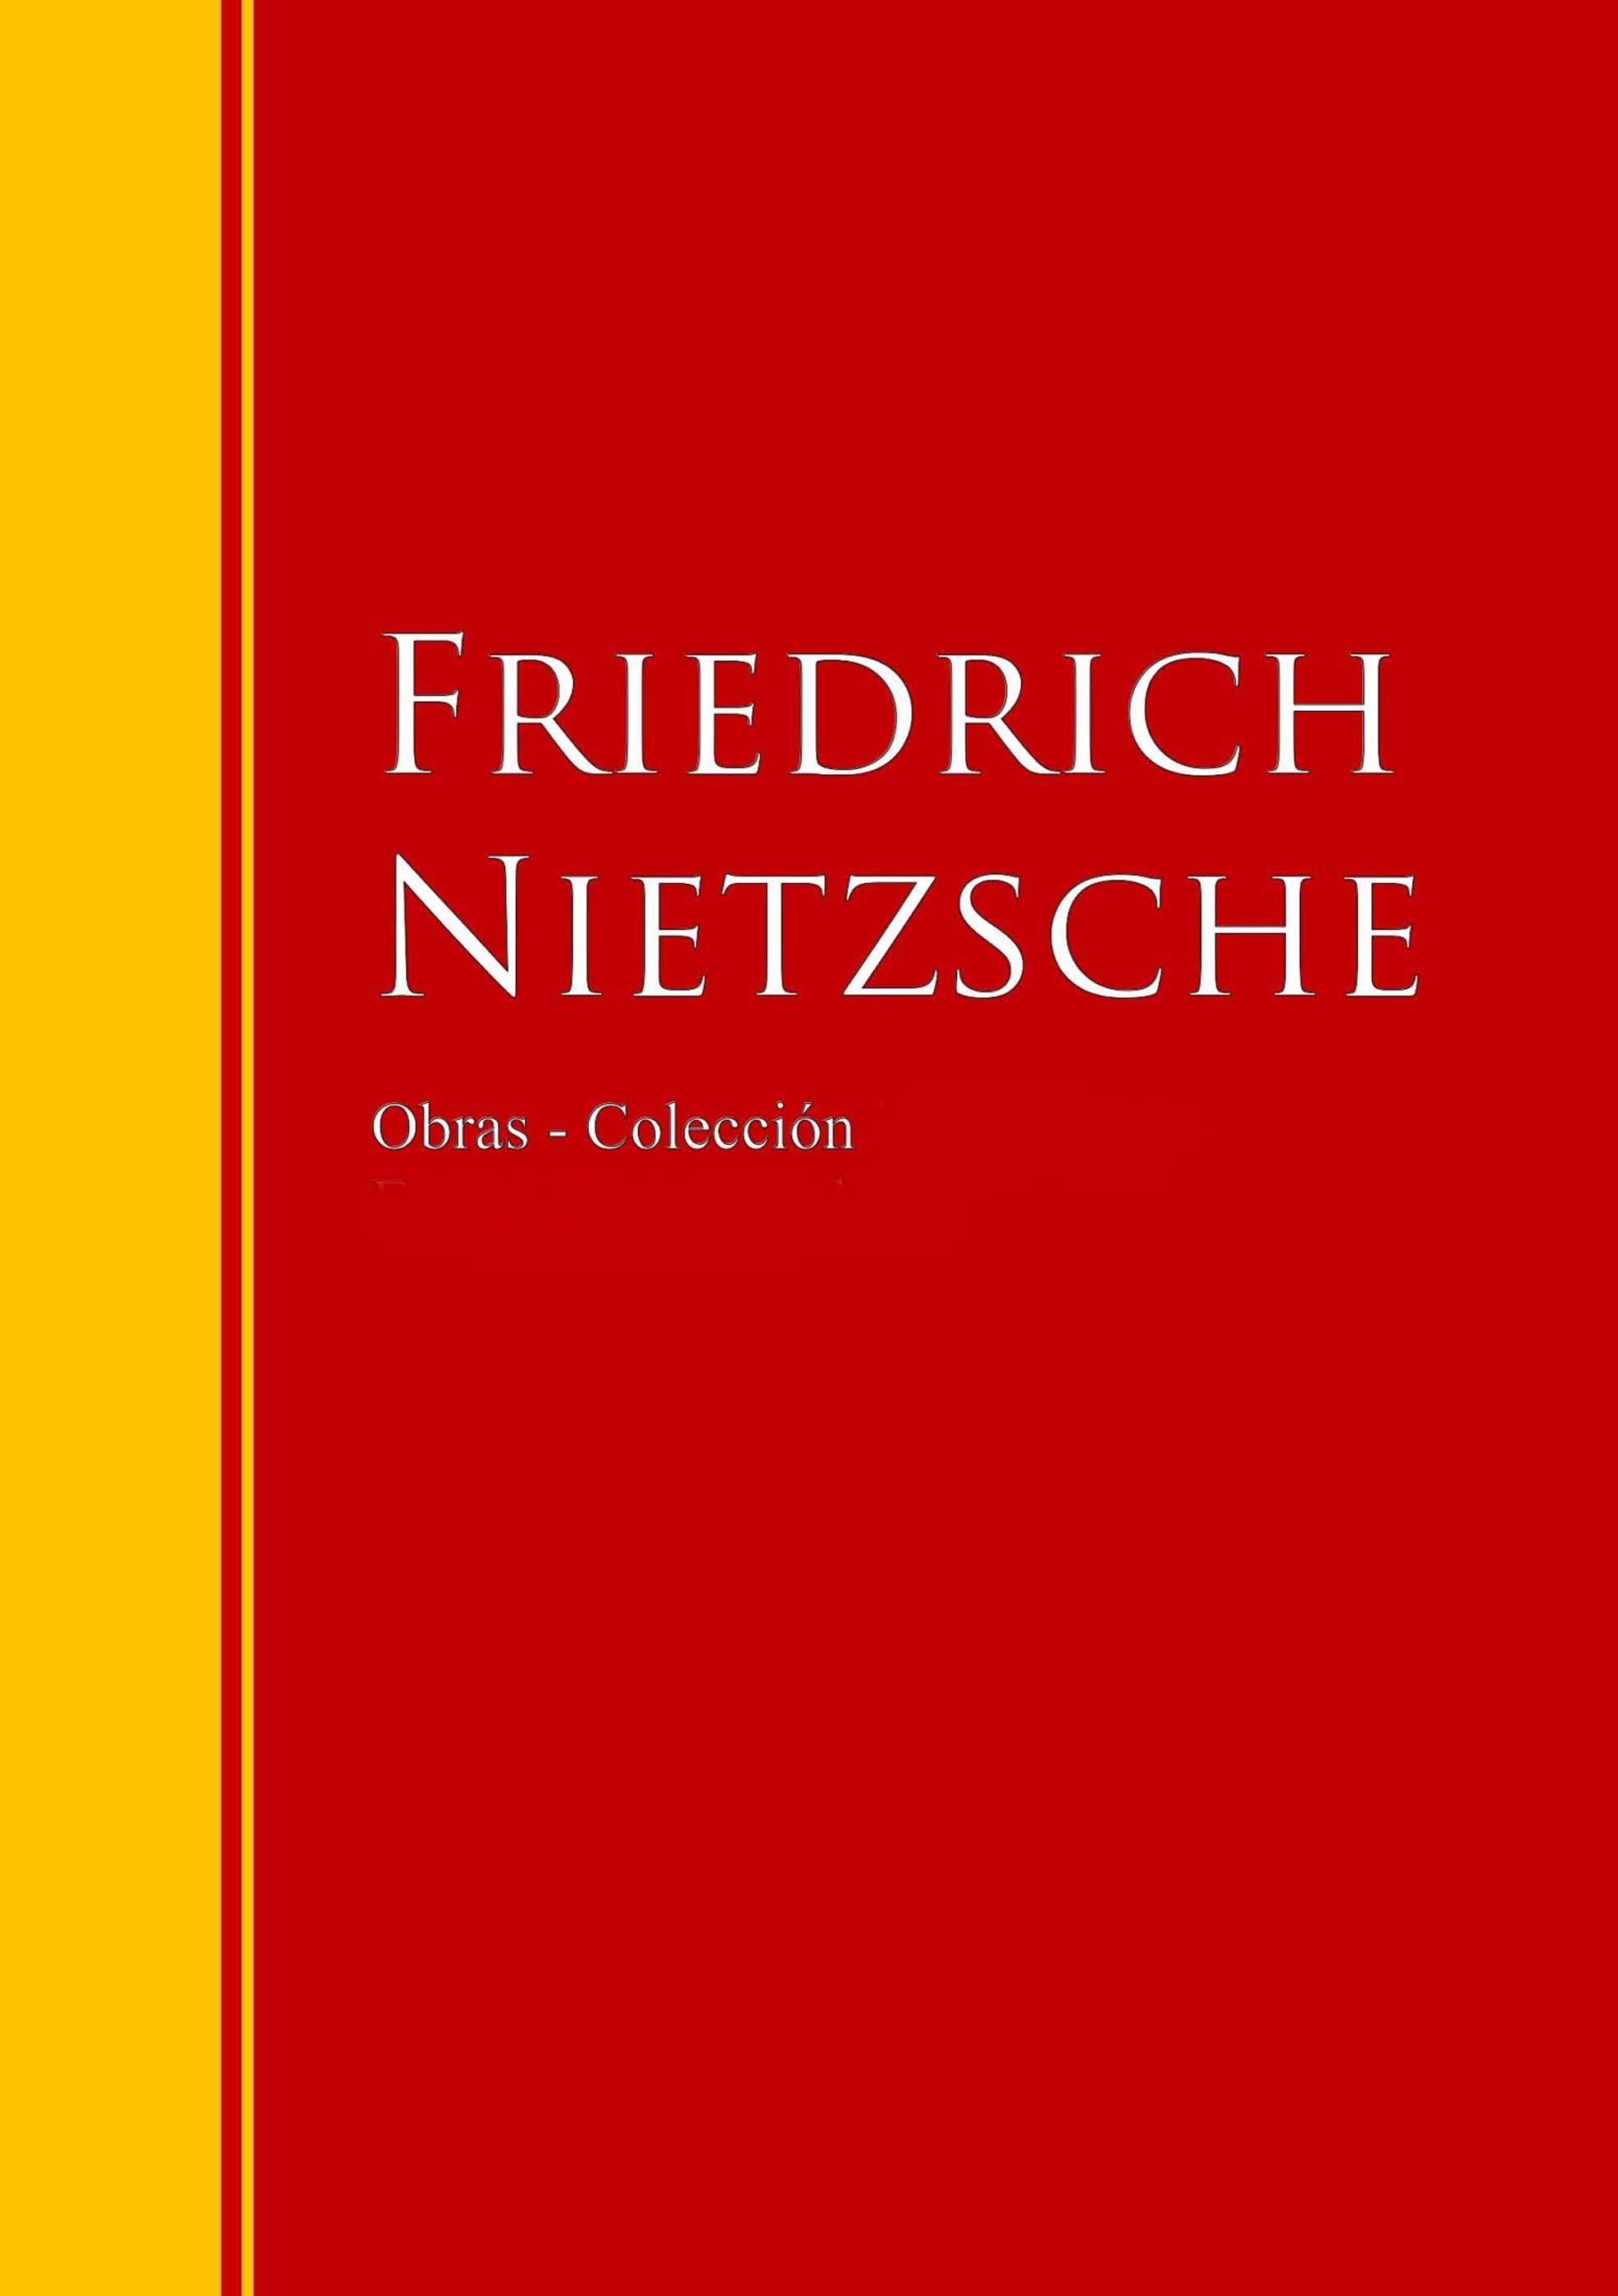 Friedrich Nietzsche Obras - Colección de Friedrich Nietzsche